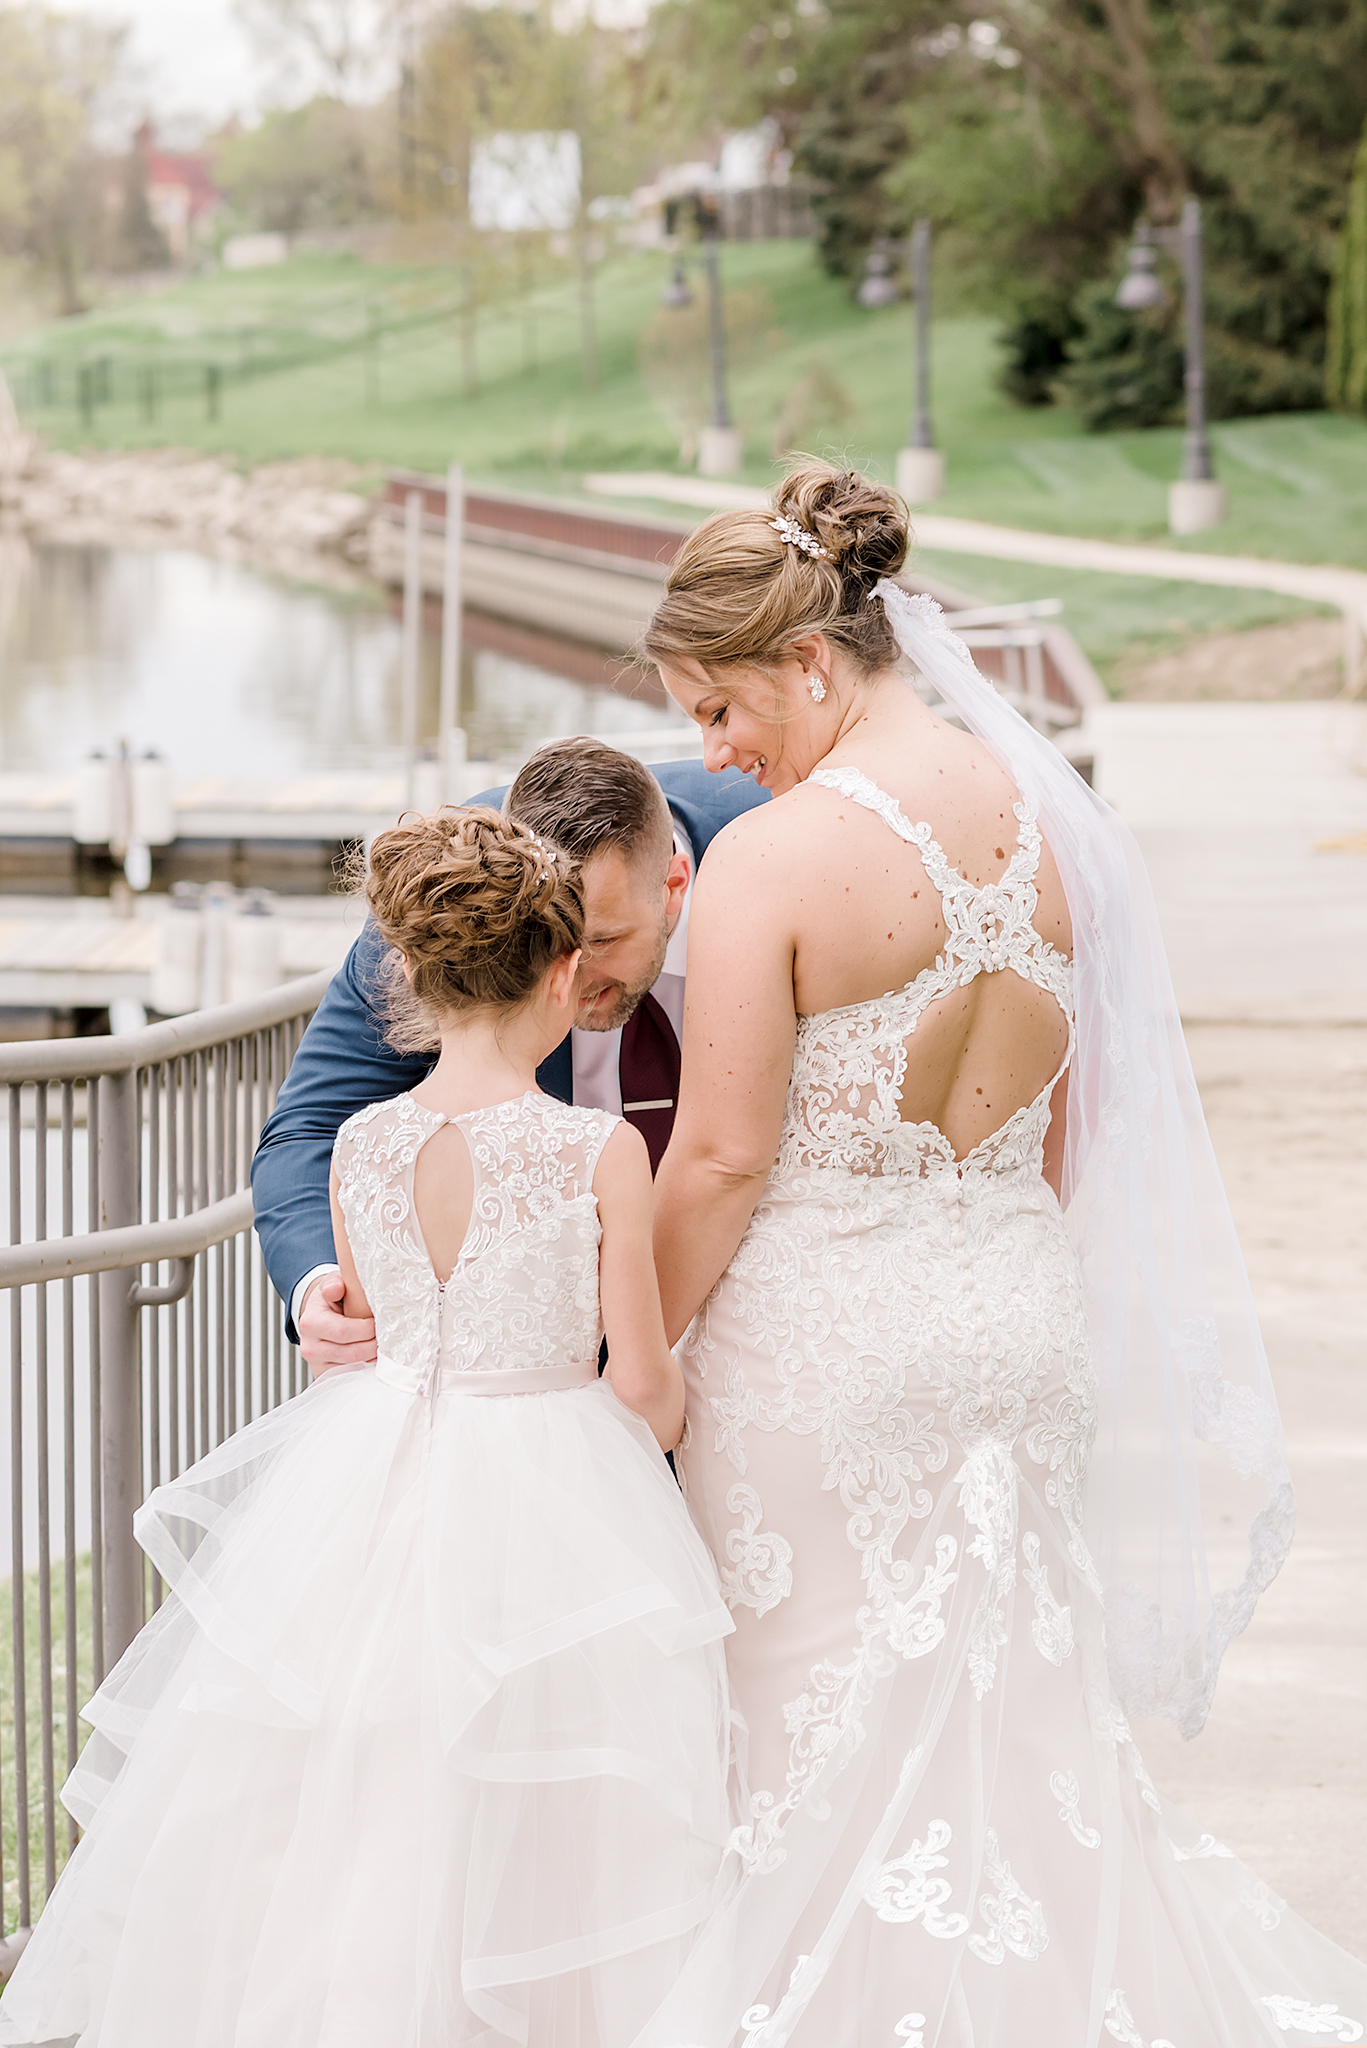 LINDSAY-ADKINS-PHOTOGRAPHY-MICHIGAN-WEDDING-PHOTOGRAPHER-FRANKENMUTH-BREWERY-WEDDING-MICHIGAN-BLOG-42